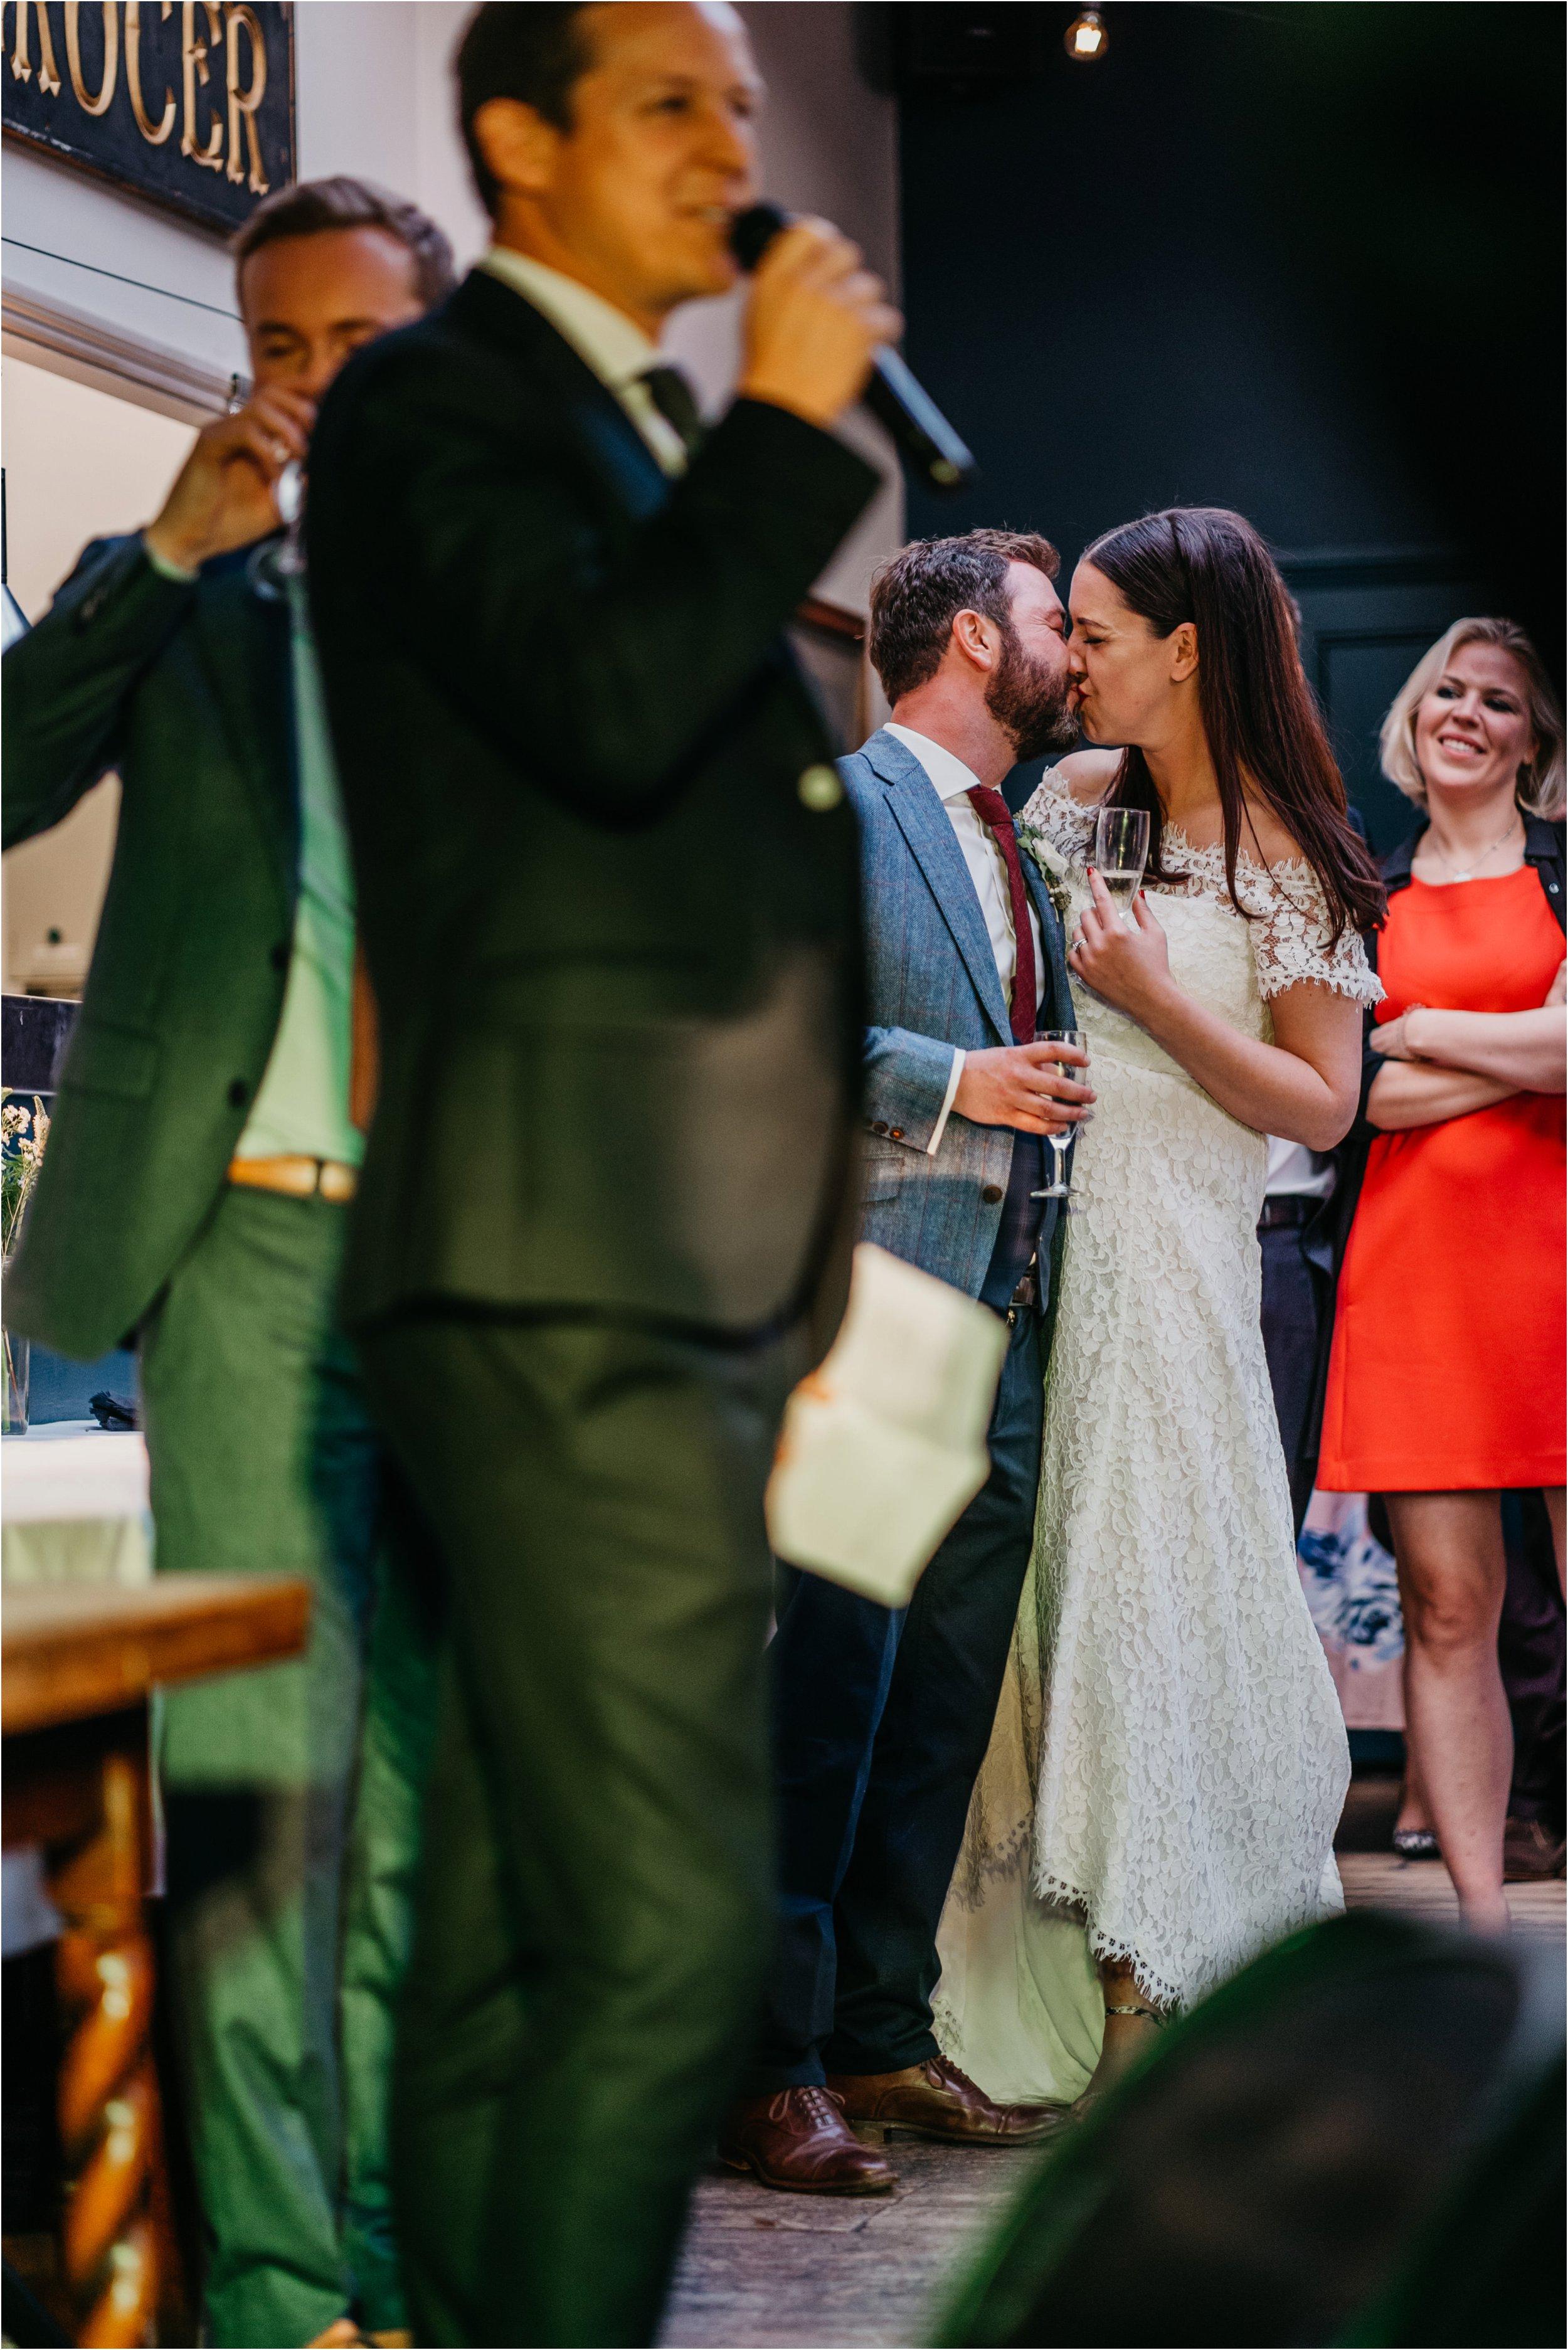 Lordship Pub Dulwich wedding photographer_0141.jpg